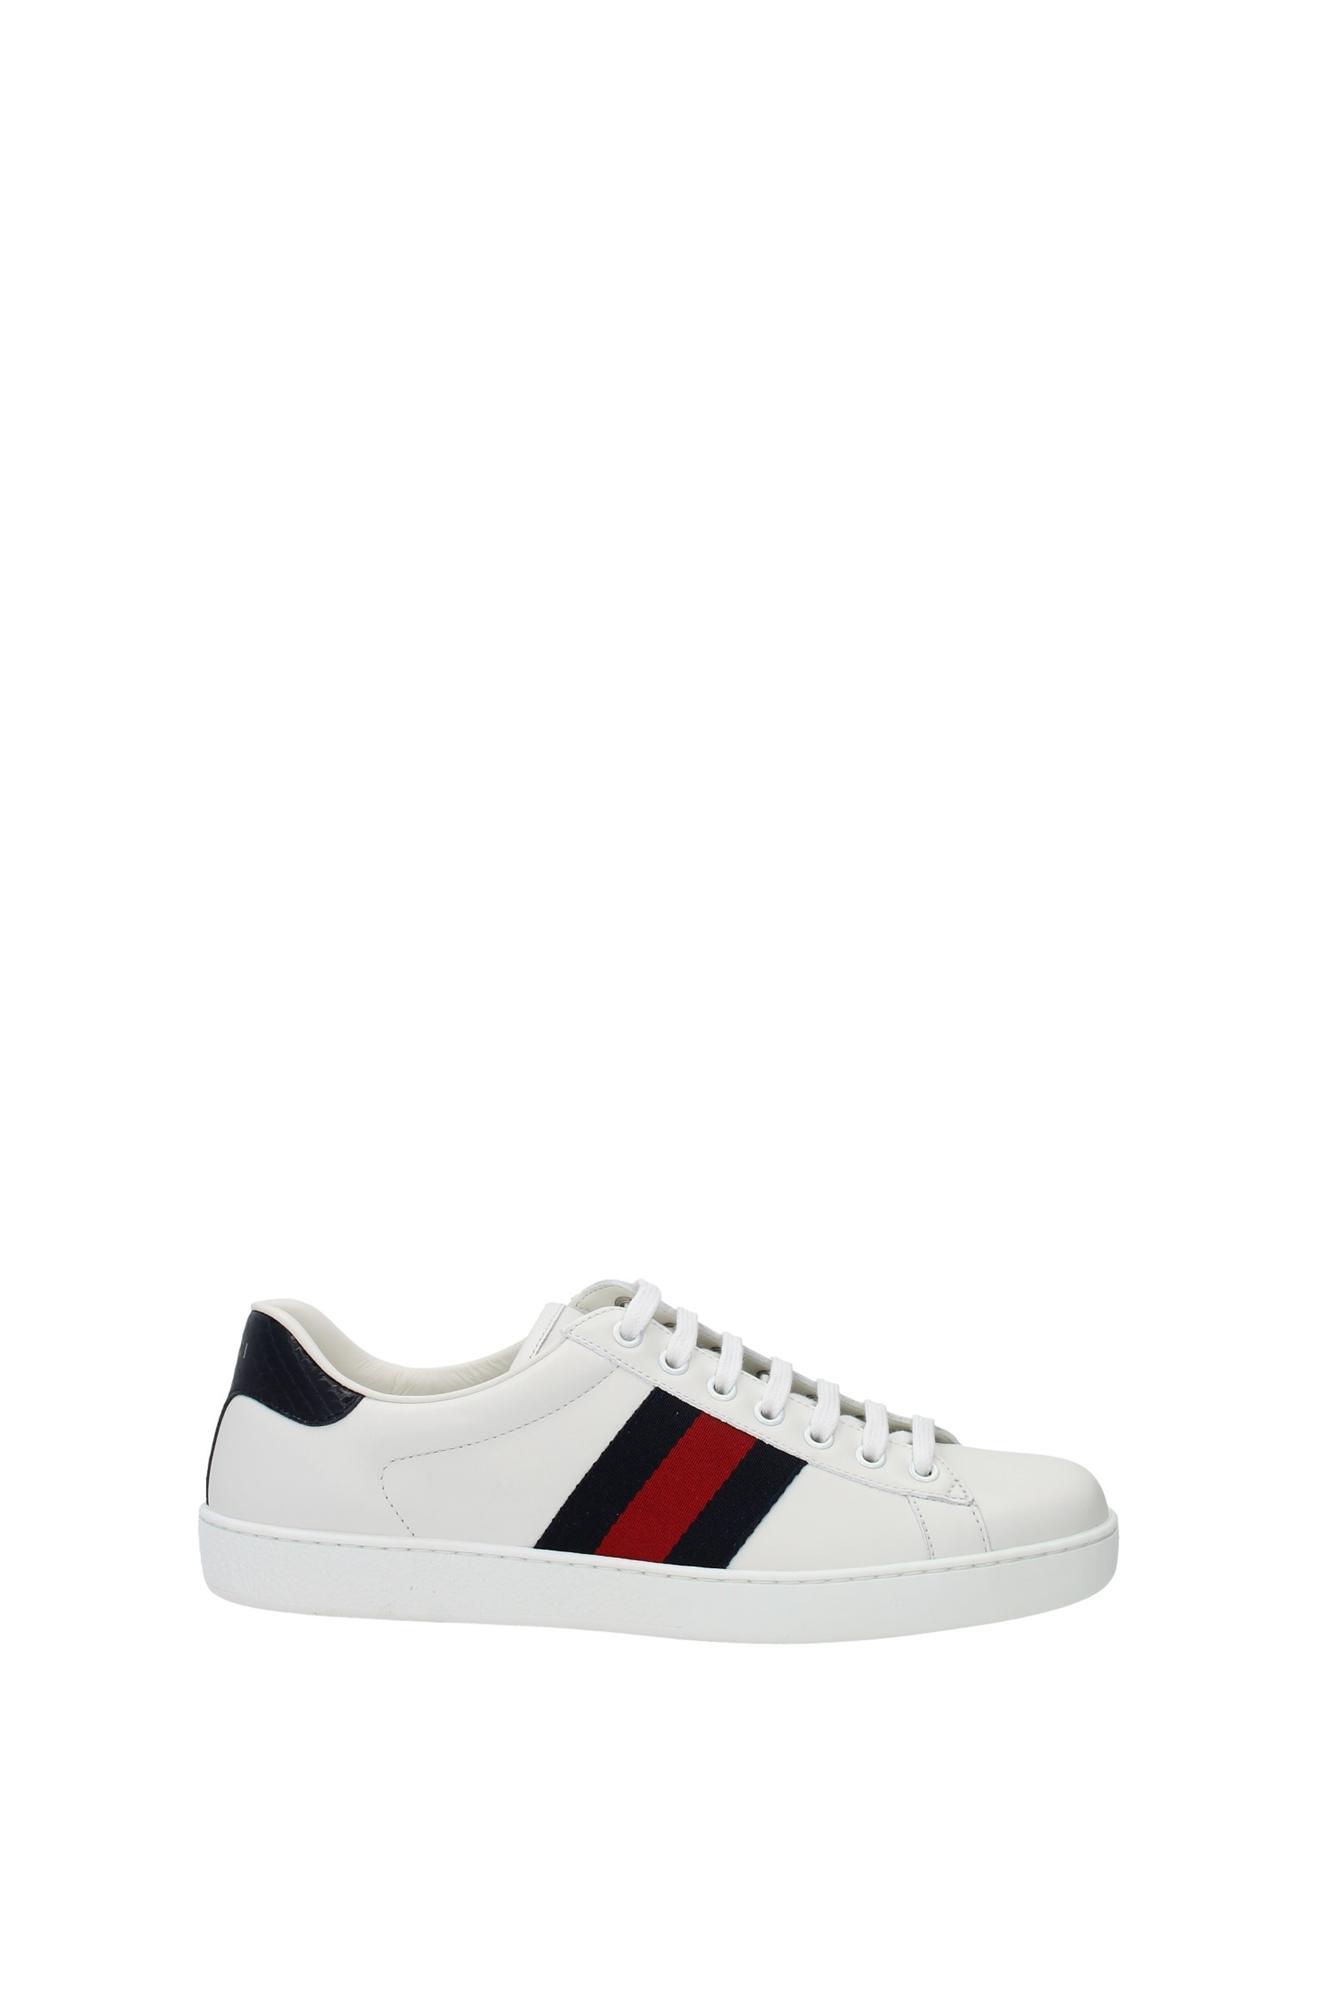 9427c5a27 Купить Sneakers Gucci Men Leather White 386750A38D09072 на eBay.com ...